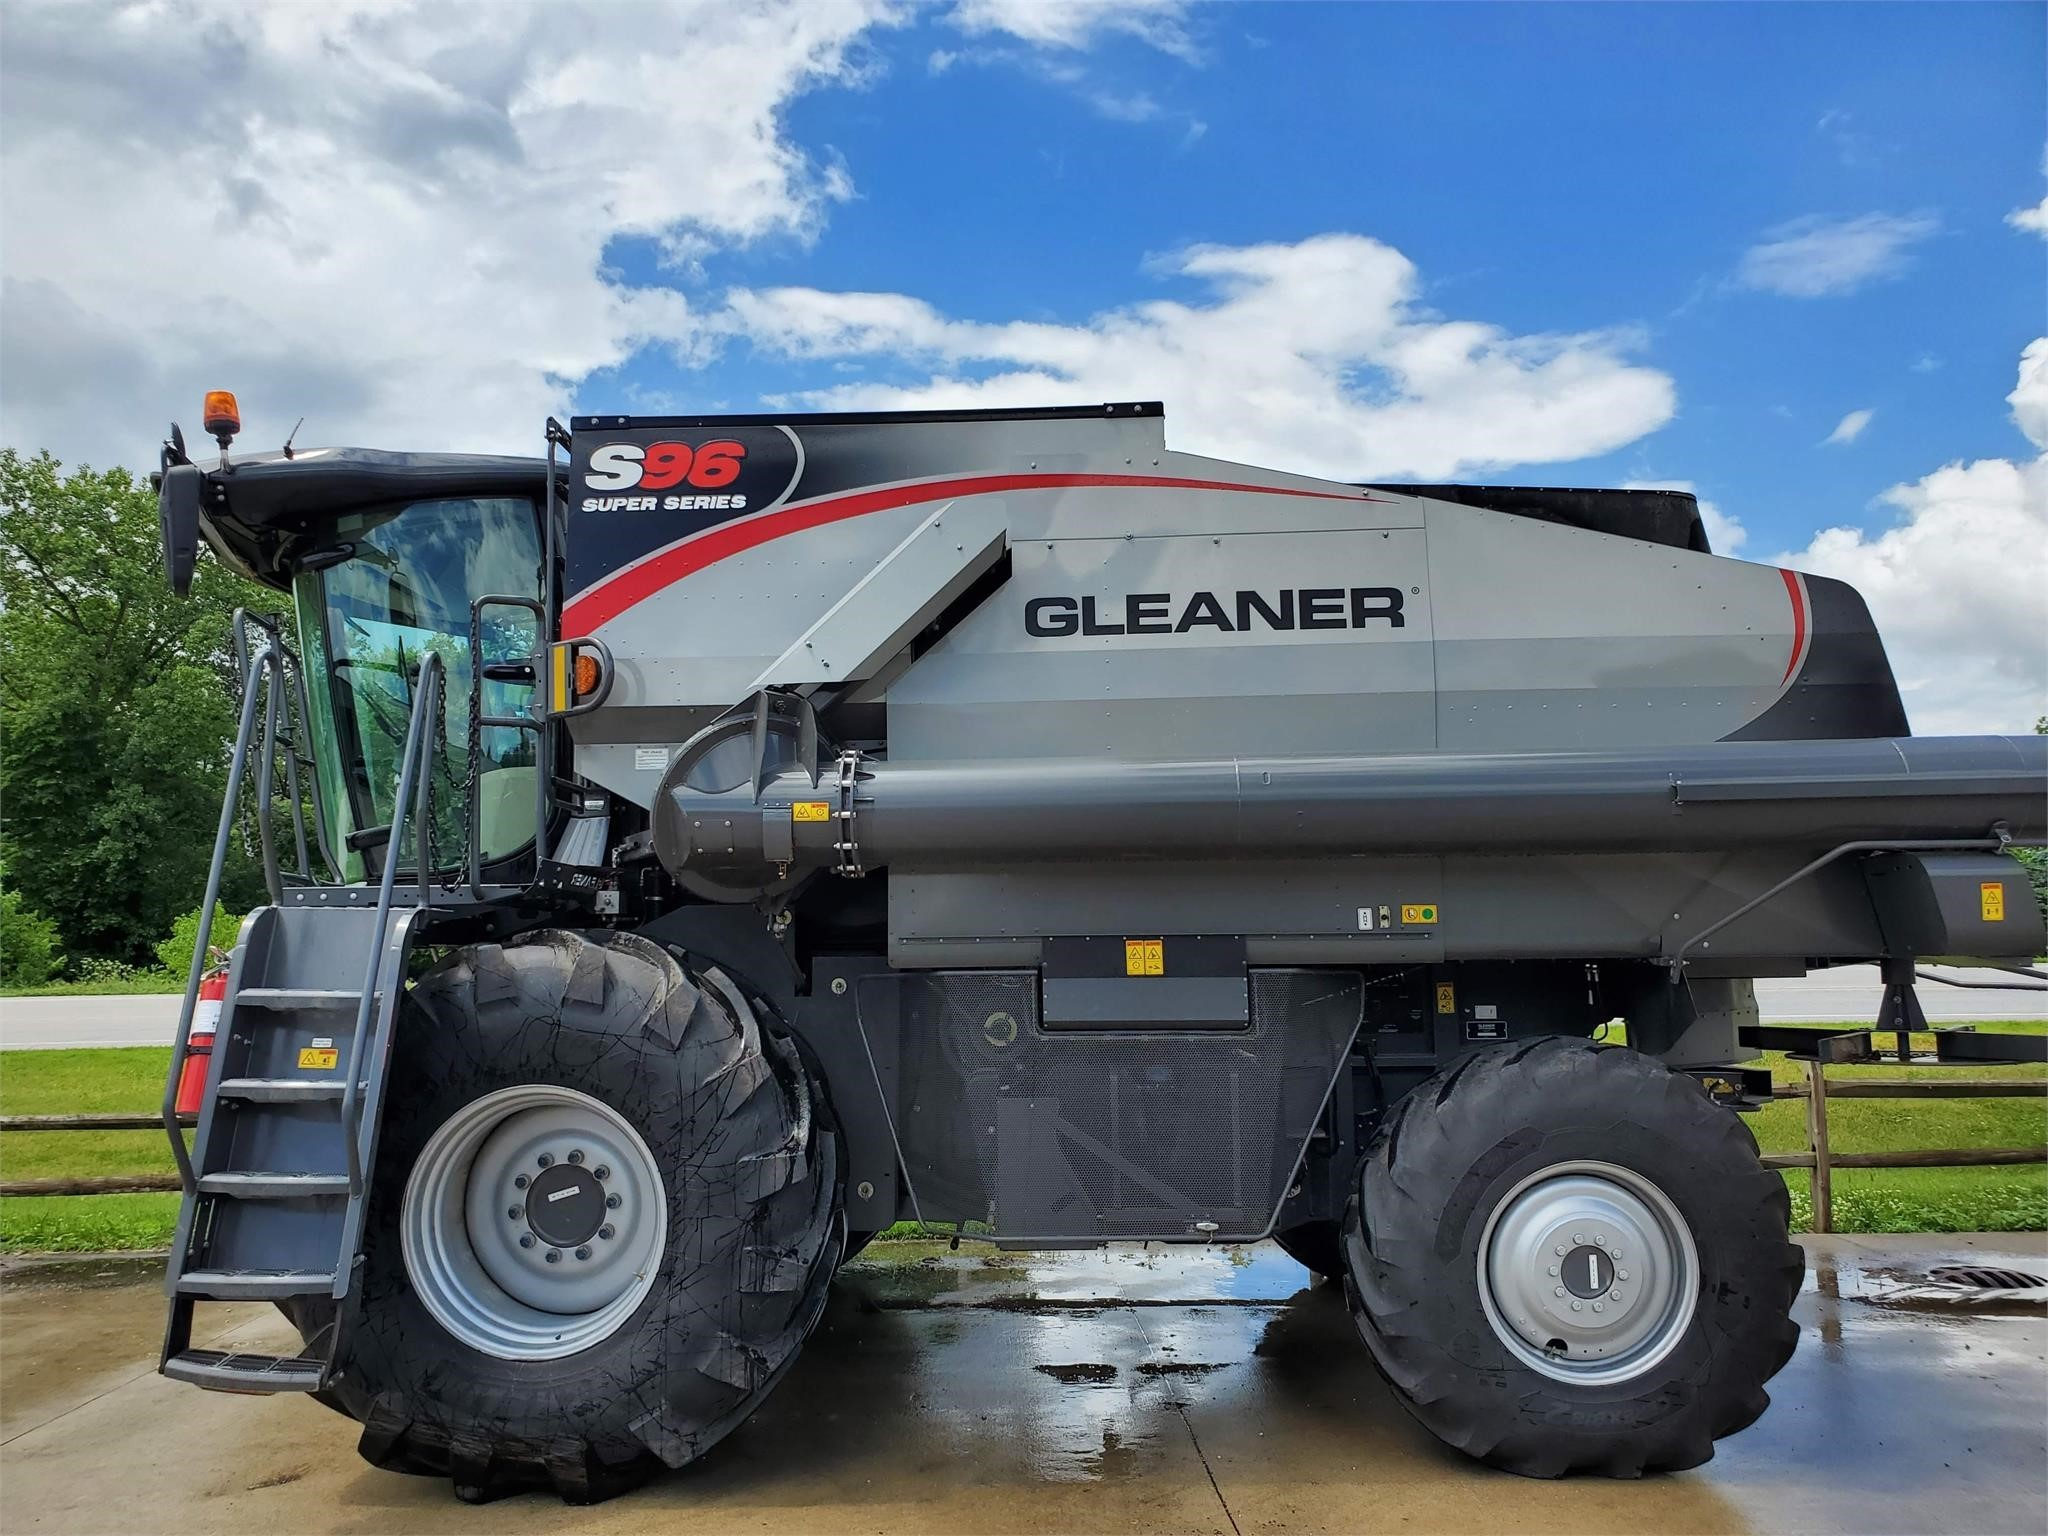 2019 Gleaner S96 Combine